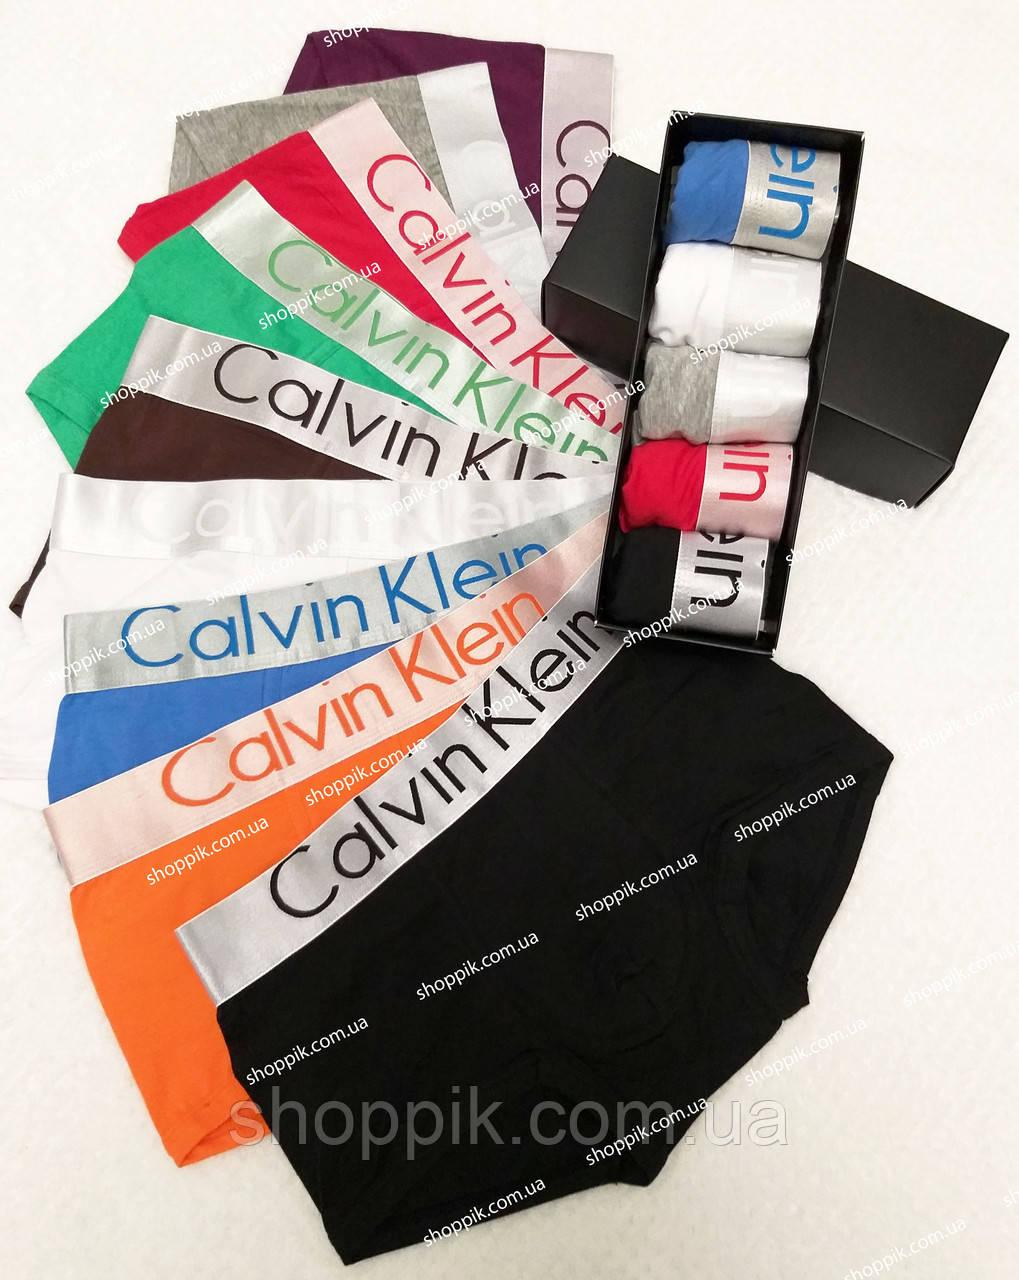 Чоловічі труси Calvin Klein 5 штук